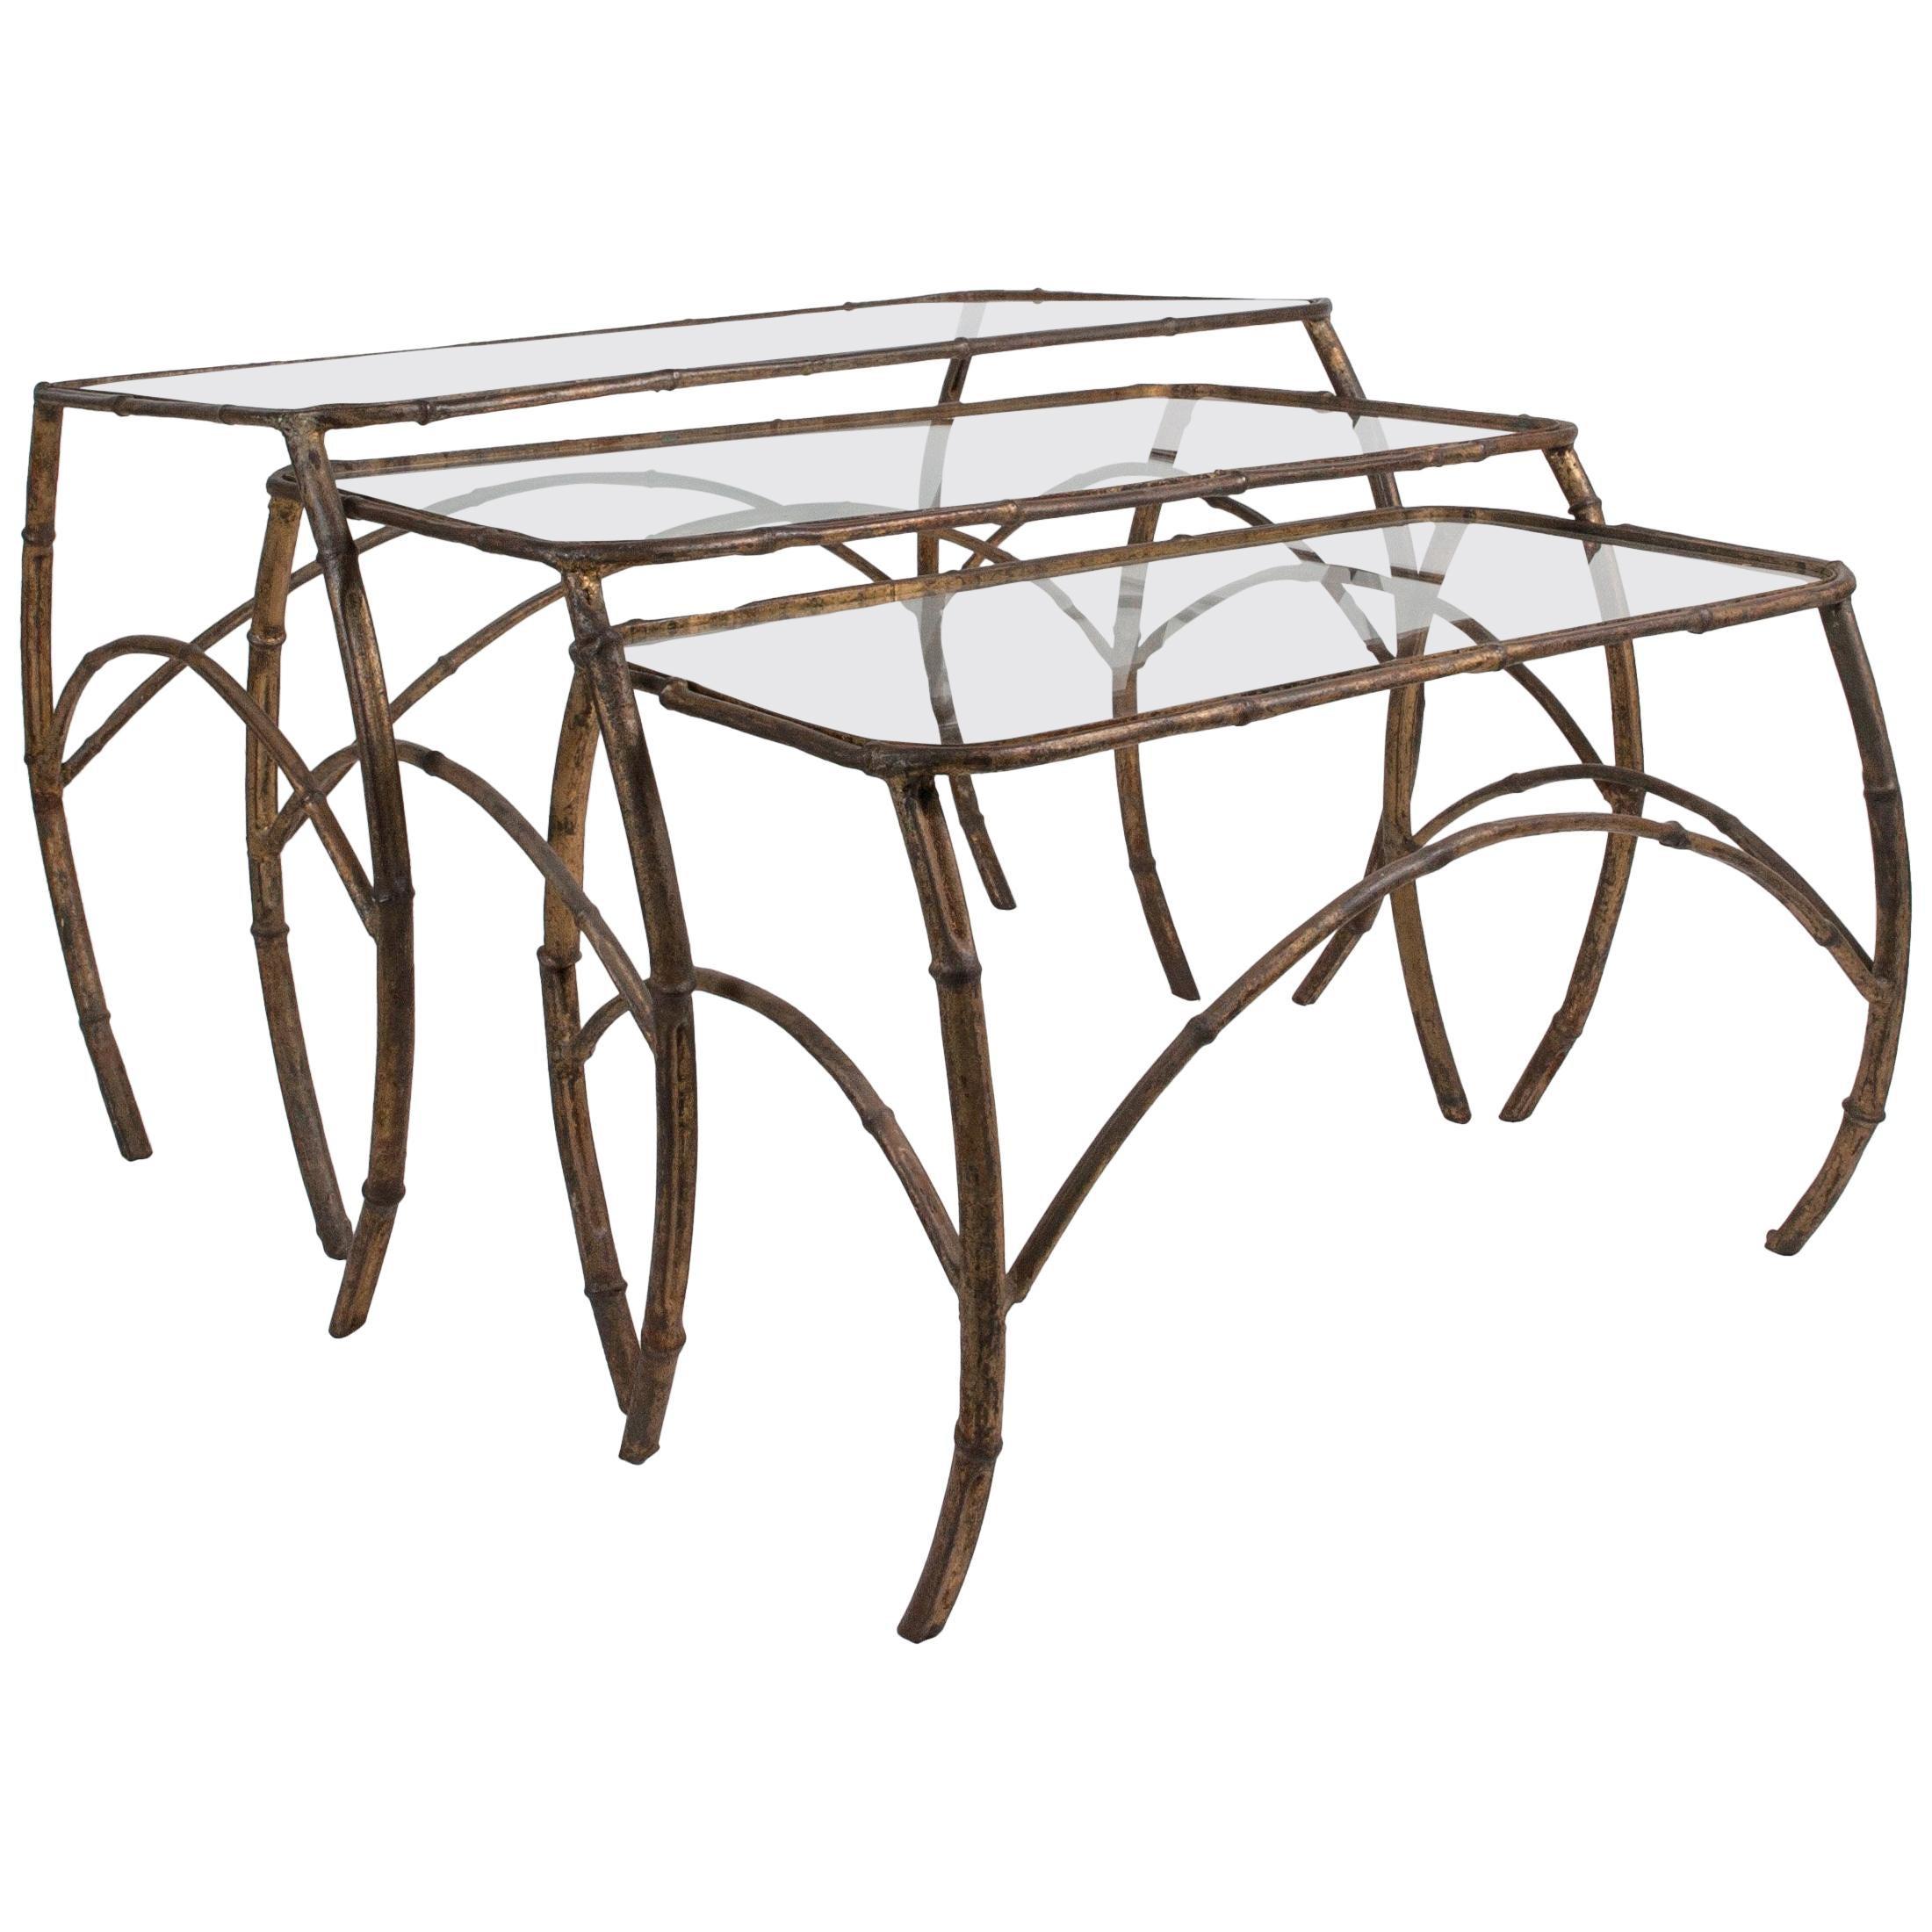 Set of French Art Deco Gilt Metal Nesting Tables